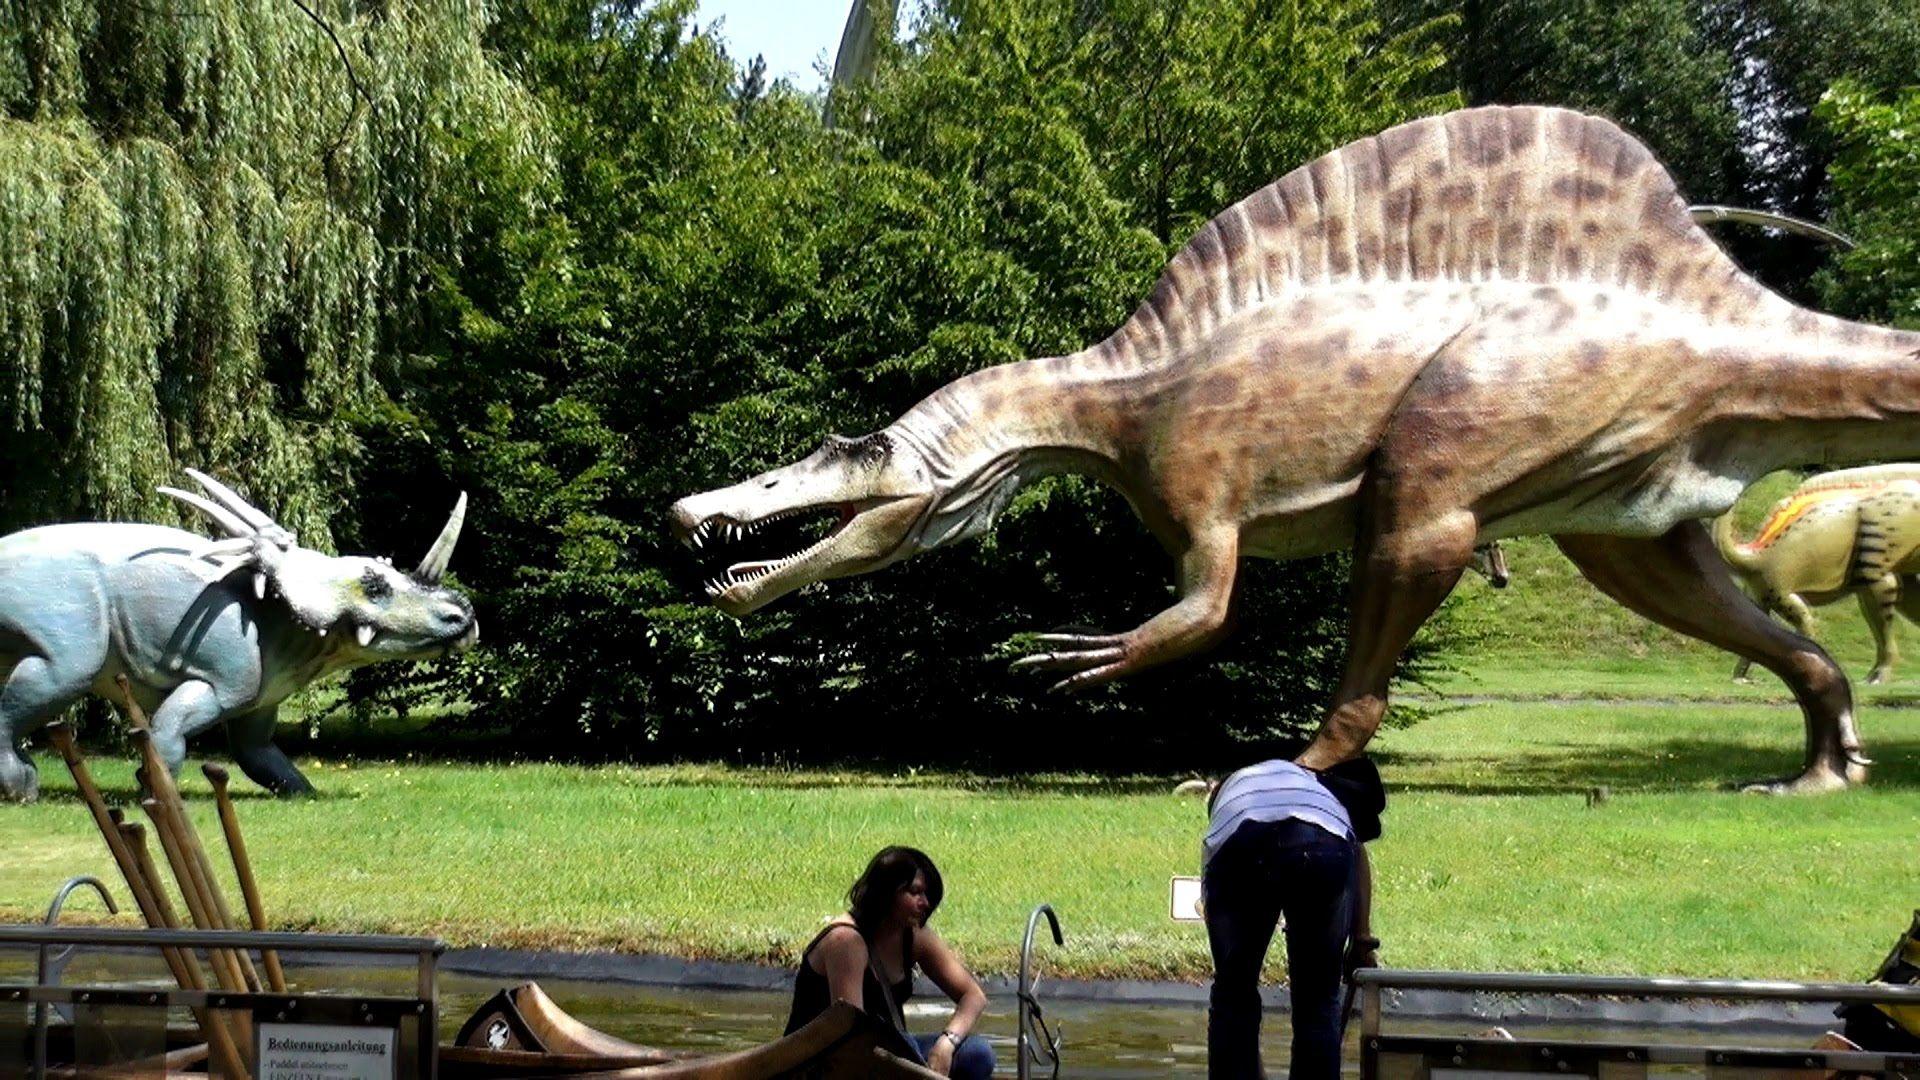 Archaeologist Surprise Egg Kinder Surprise Welcome To Jurassic Park Jurassic Park Funny Jurassic Park Lego Jurassic World